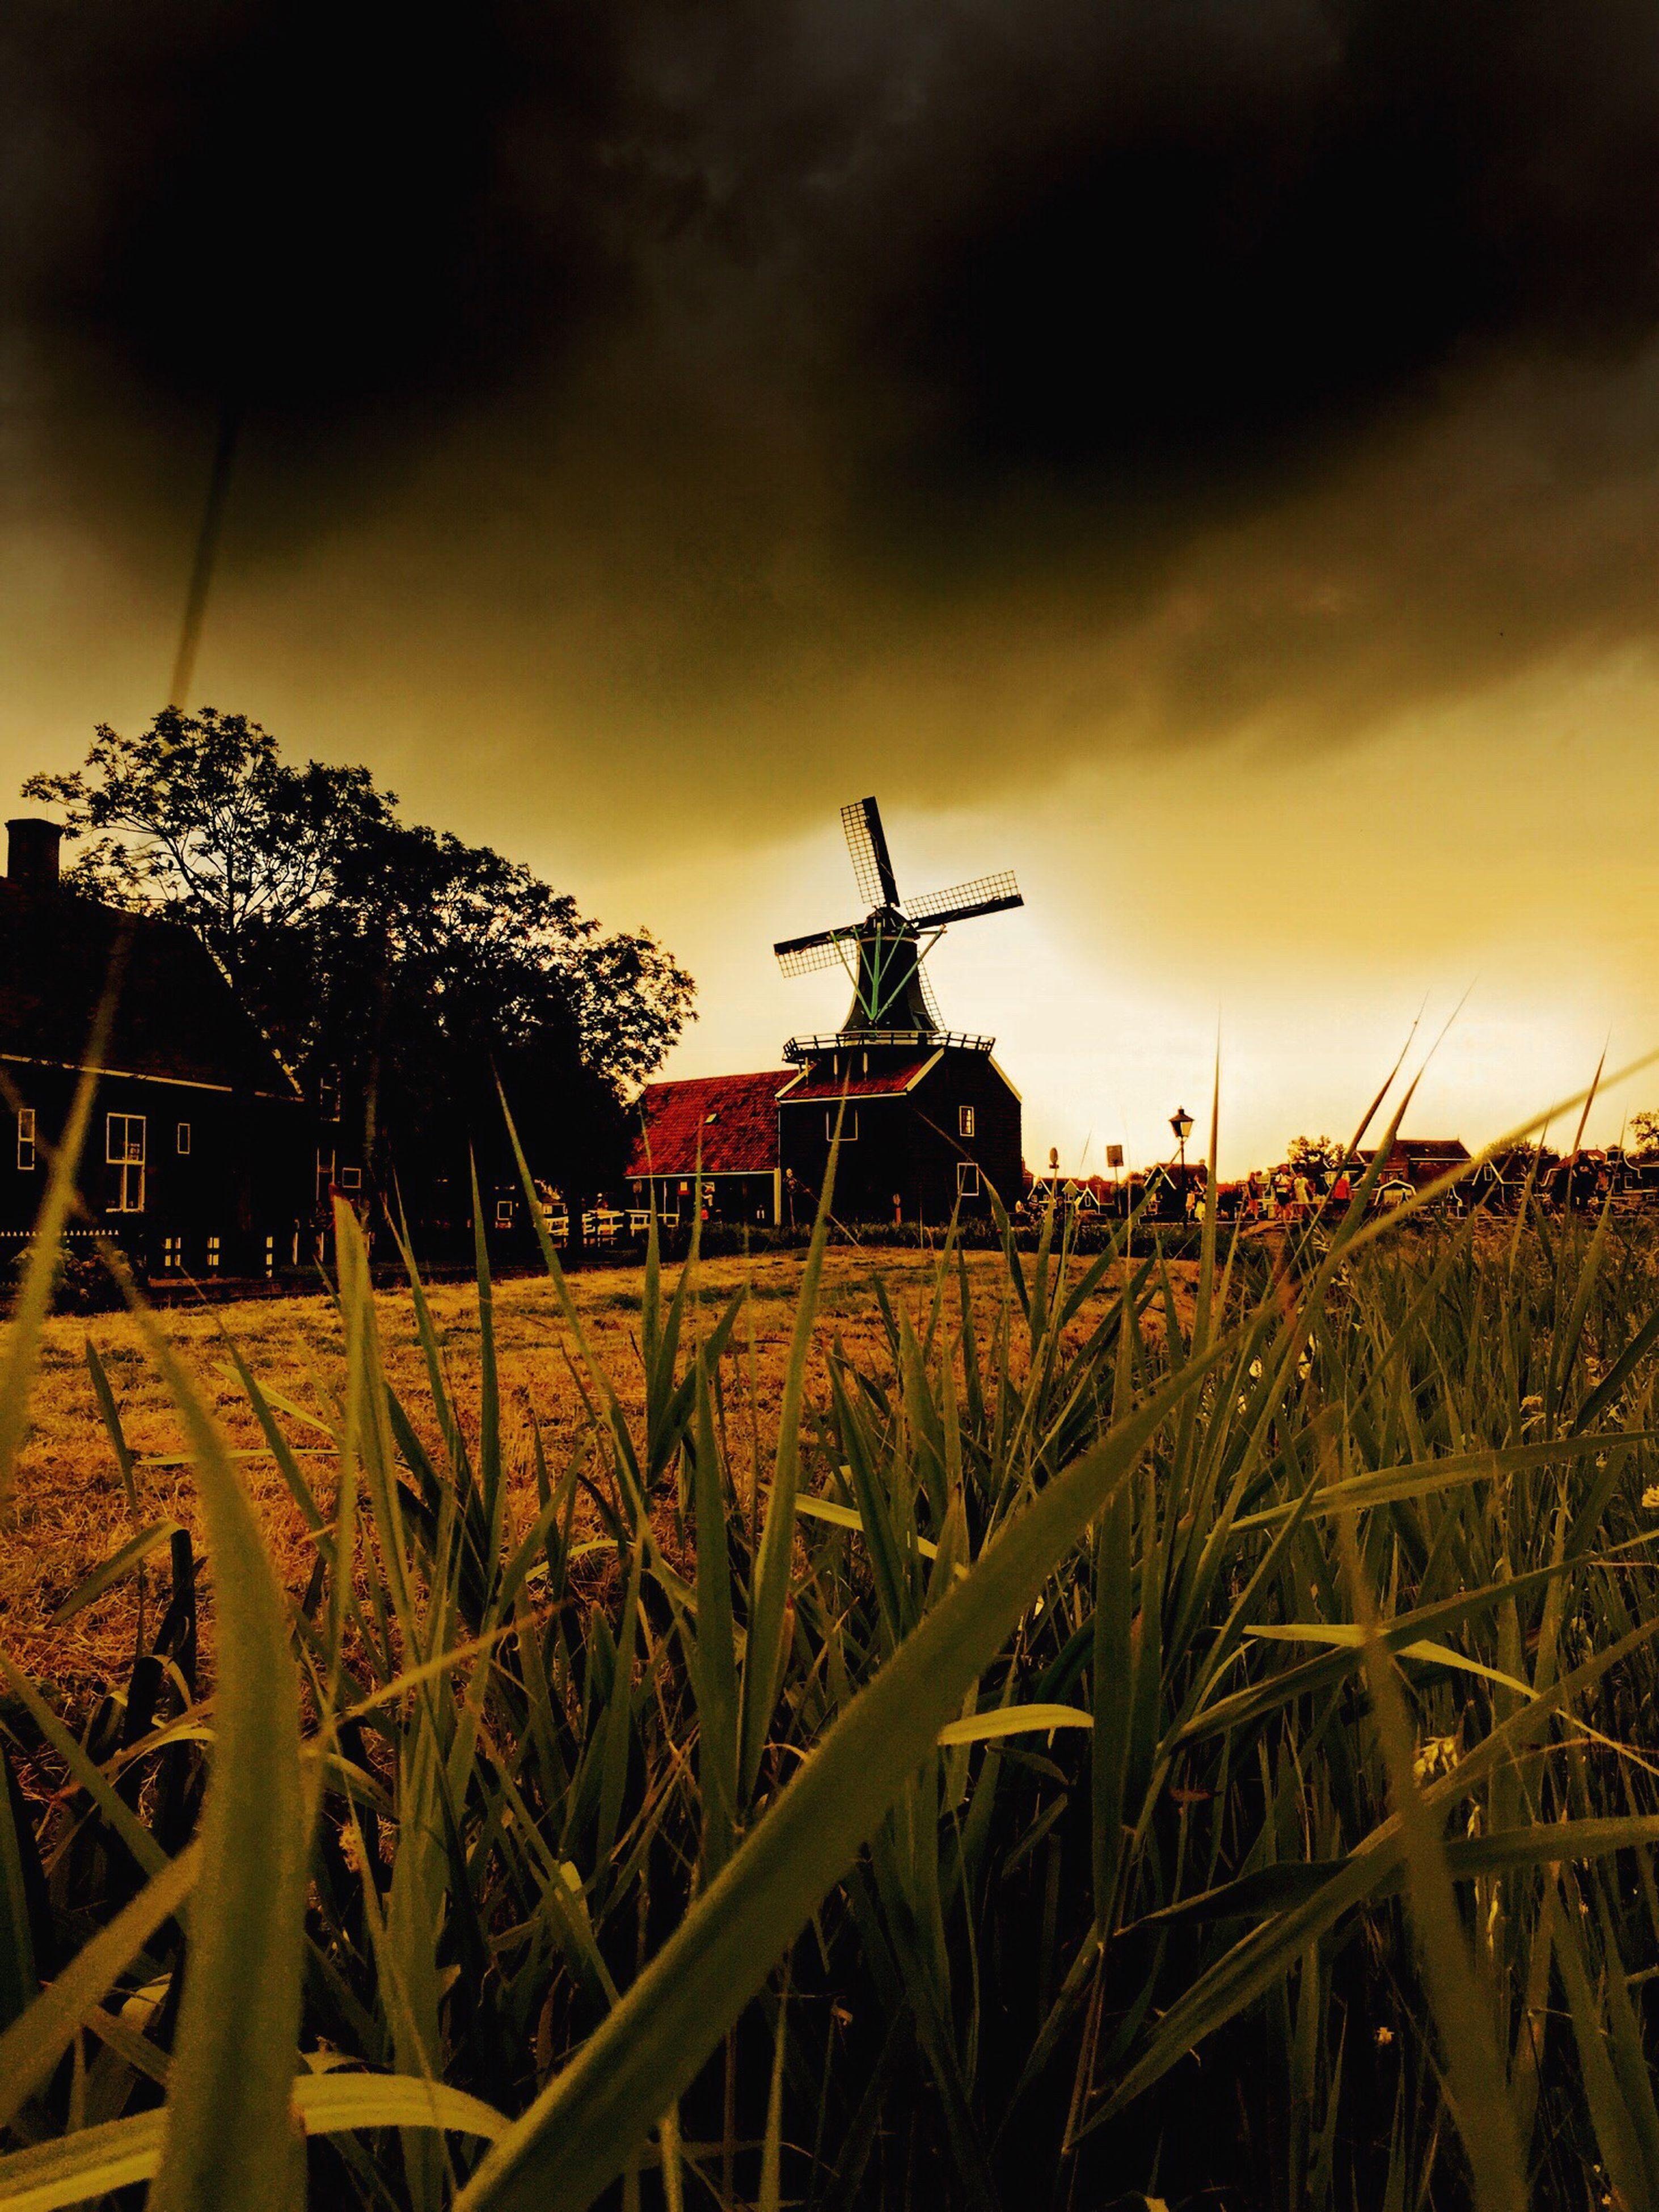 sky, field, sunset, cloud - sky, rural scene, building exterior, grass, built structure, cloudy, landscape, windmill, architecture, wind power, nature, plant, dusk, alternative energy, renewable energy, agriculture, cloud